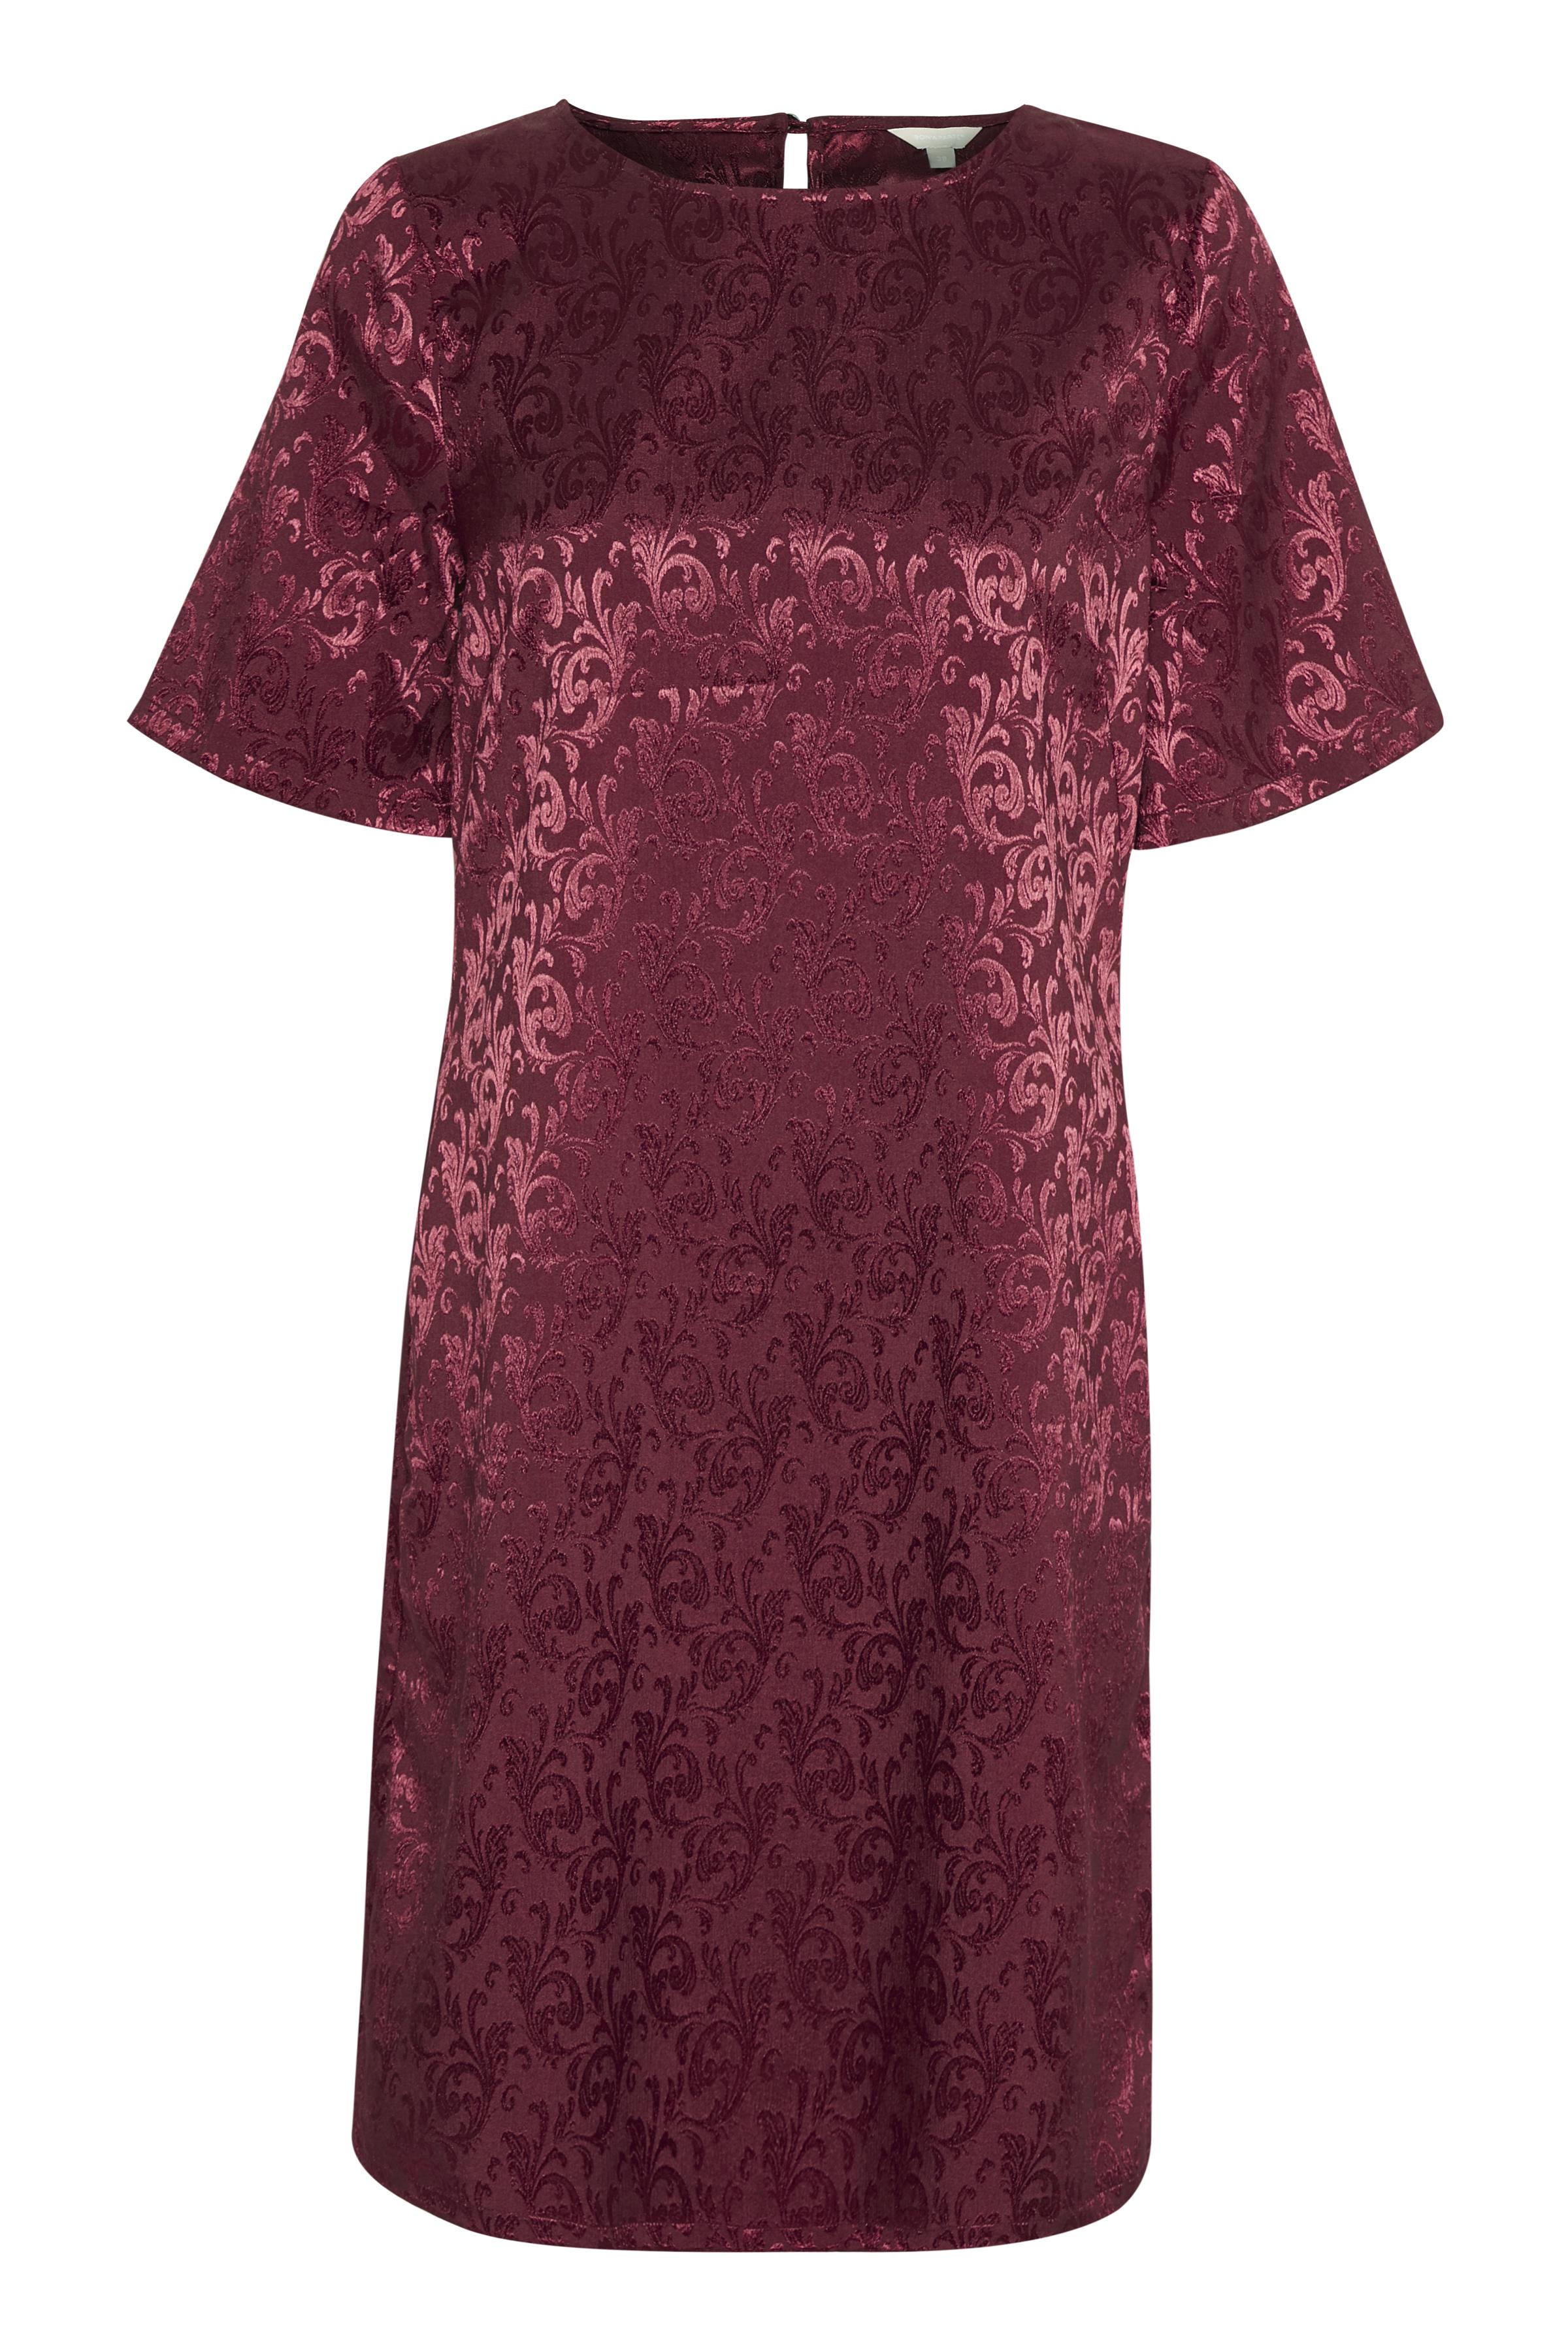 BonA Parte Dame Letvævet kjole - Mørkerød